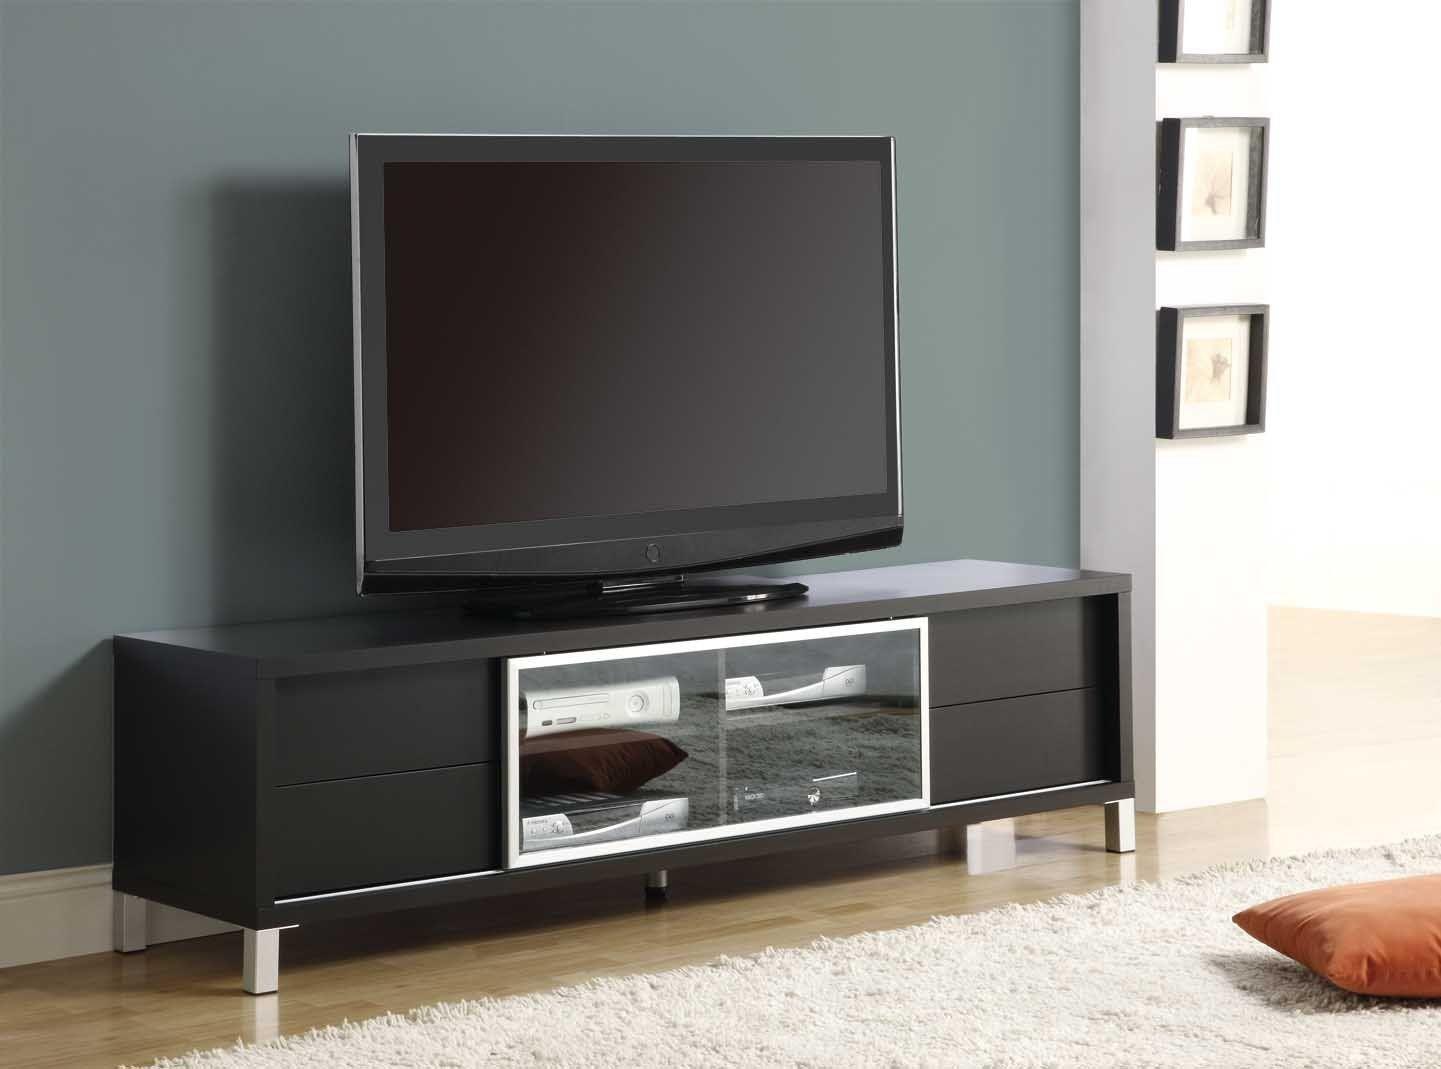 Monarch Specialties Cappuccino Hollow Core 70 Inch Euro TV Console